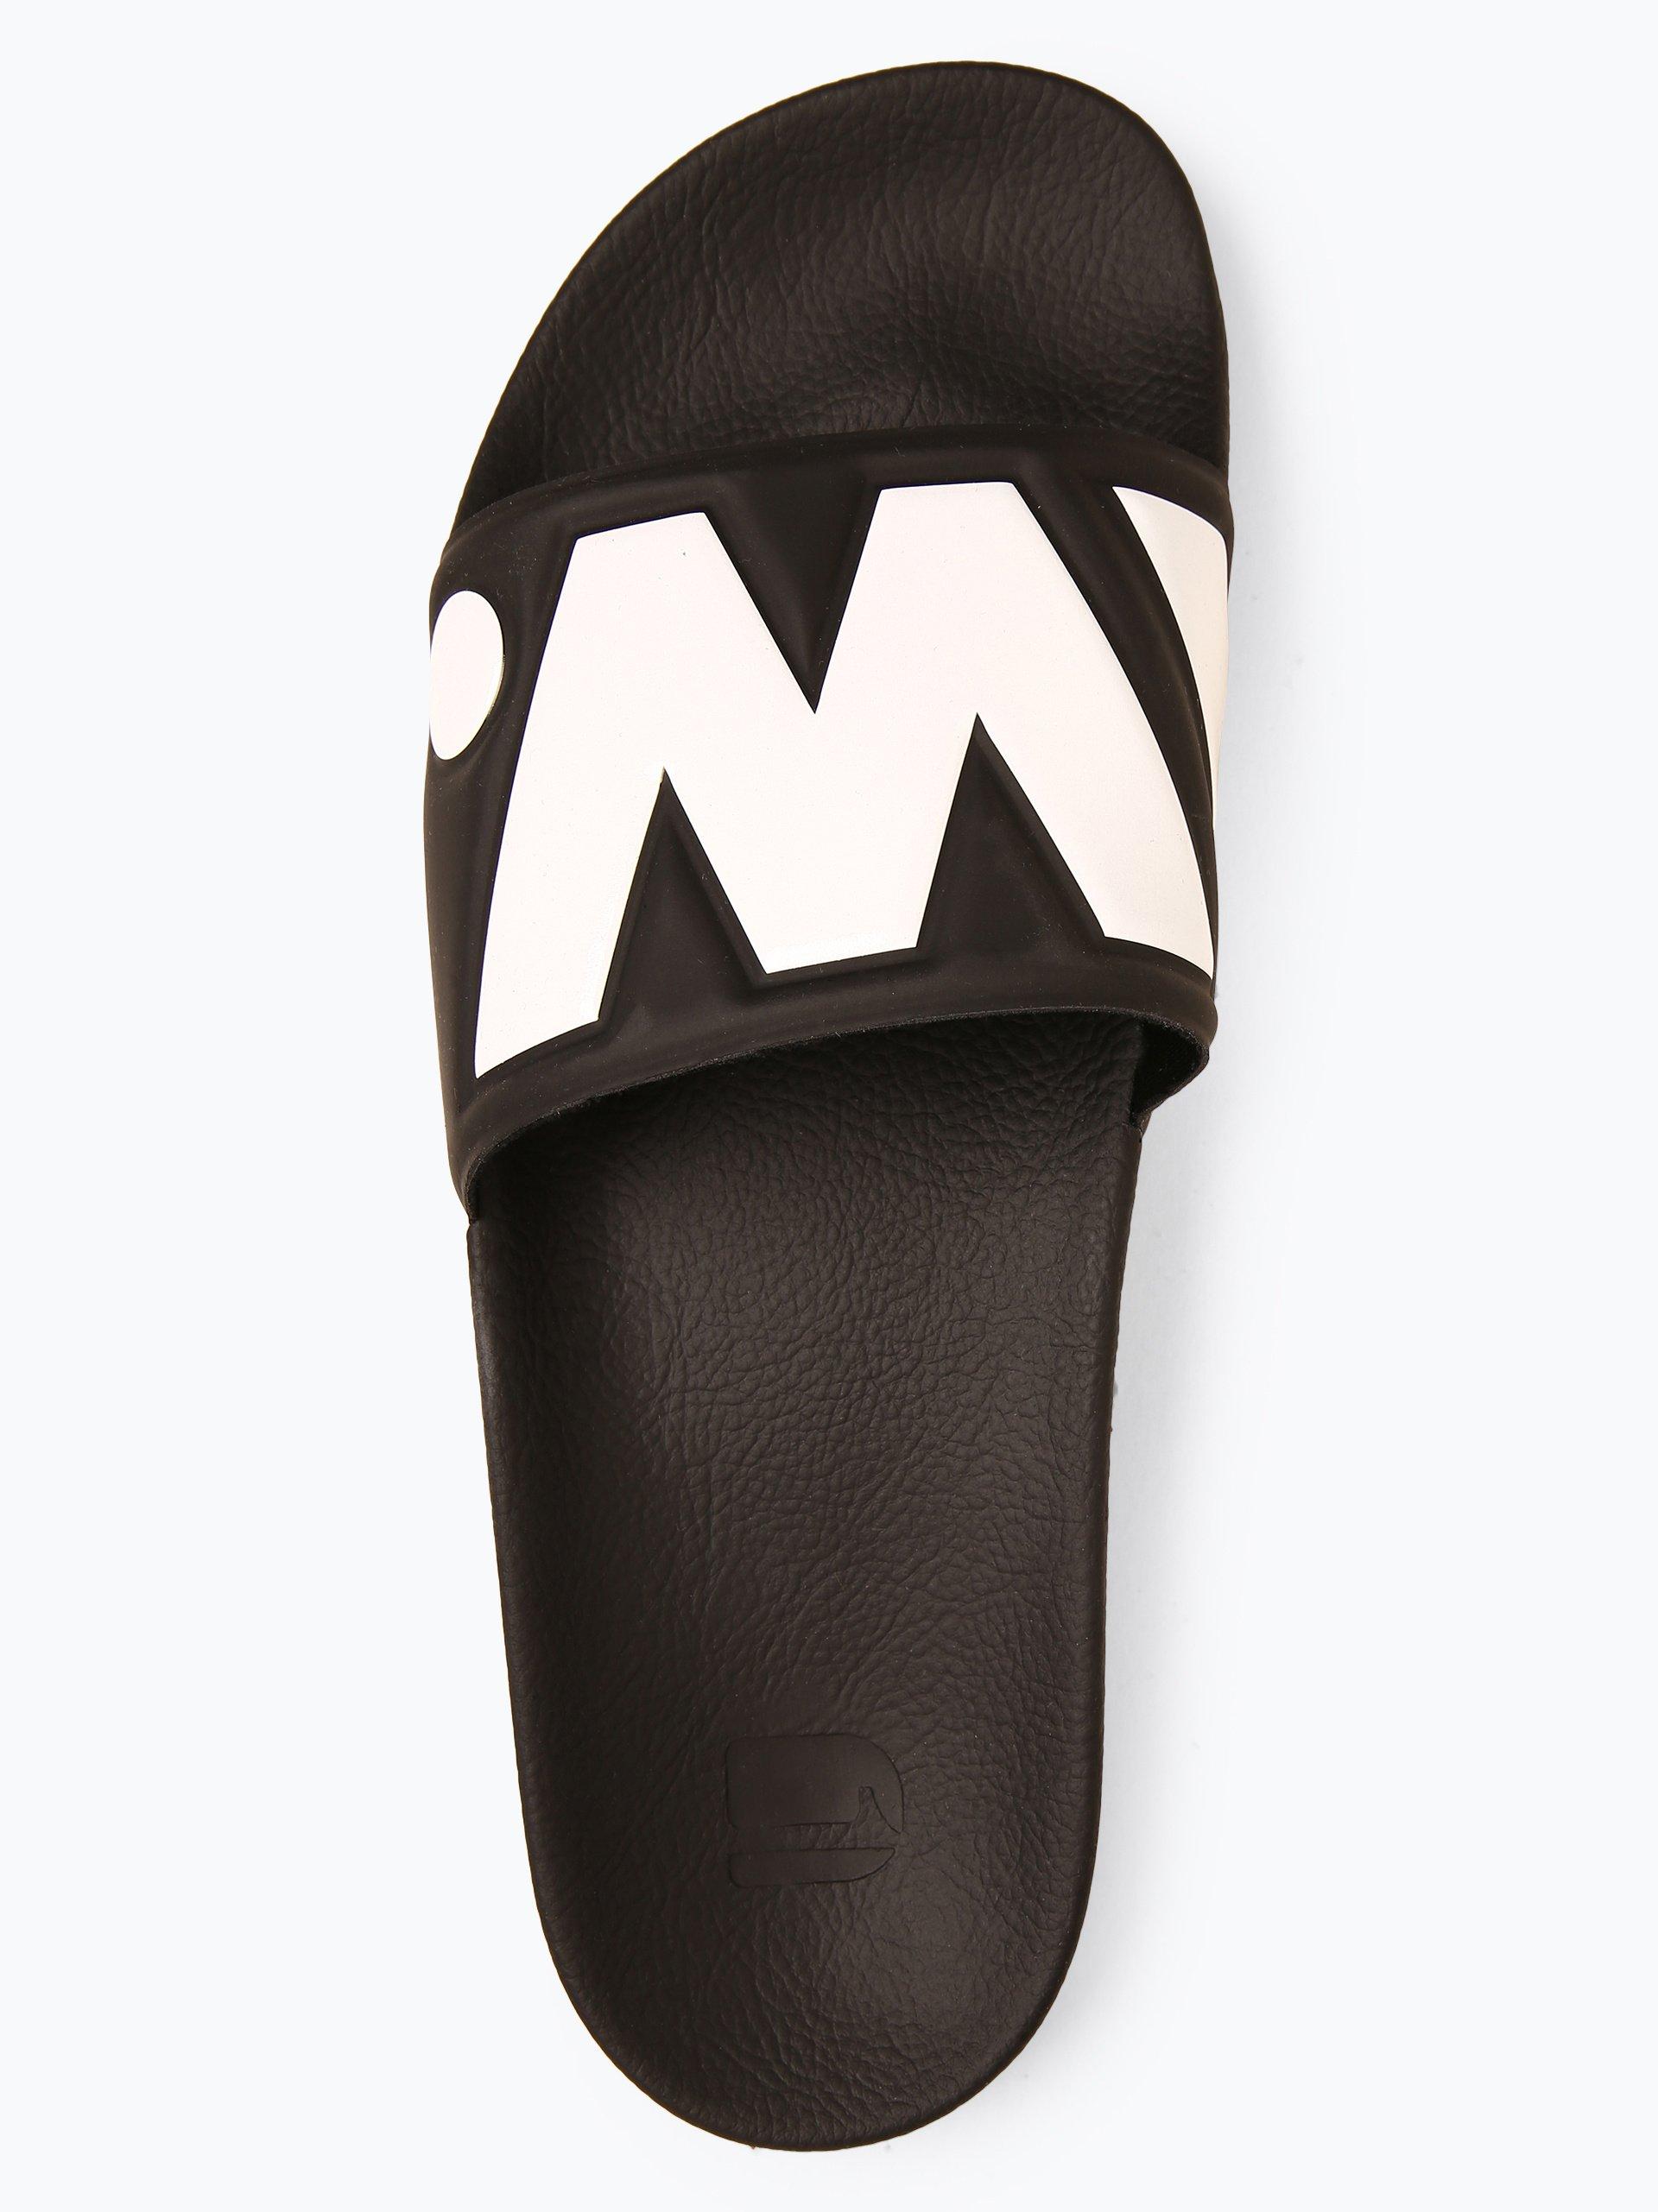 G-Star RAW Męskie pantofle kąpielowe – Cart